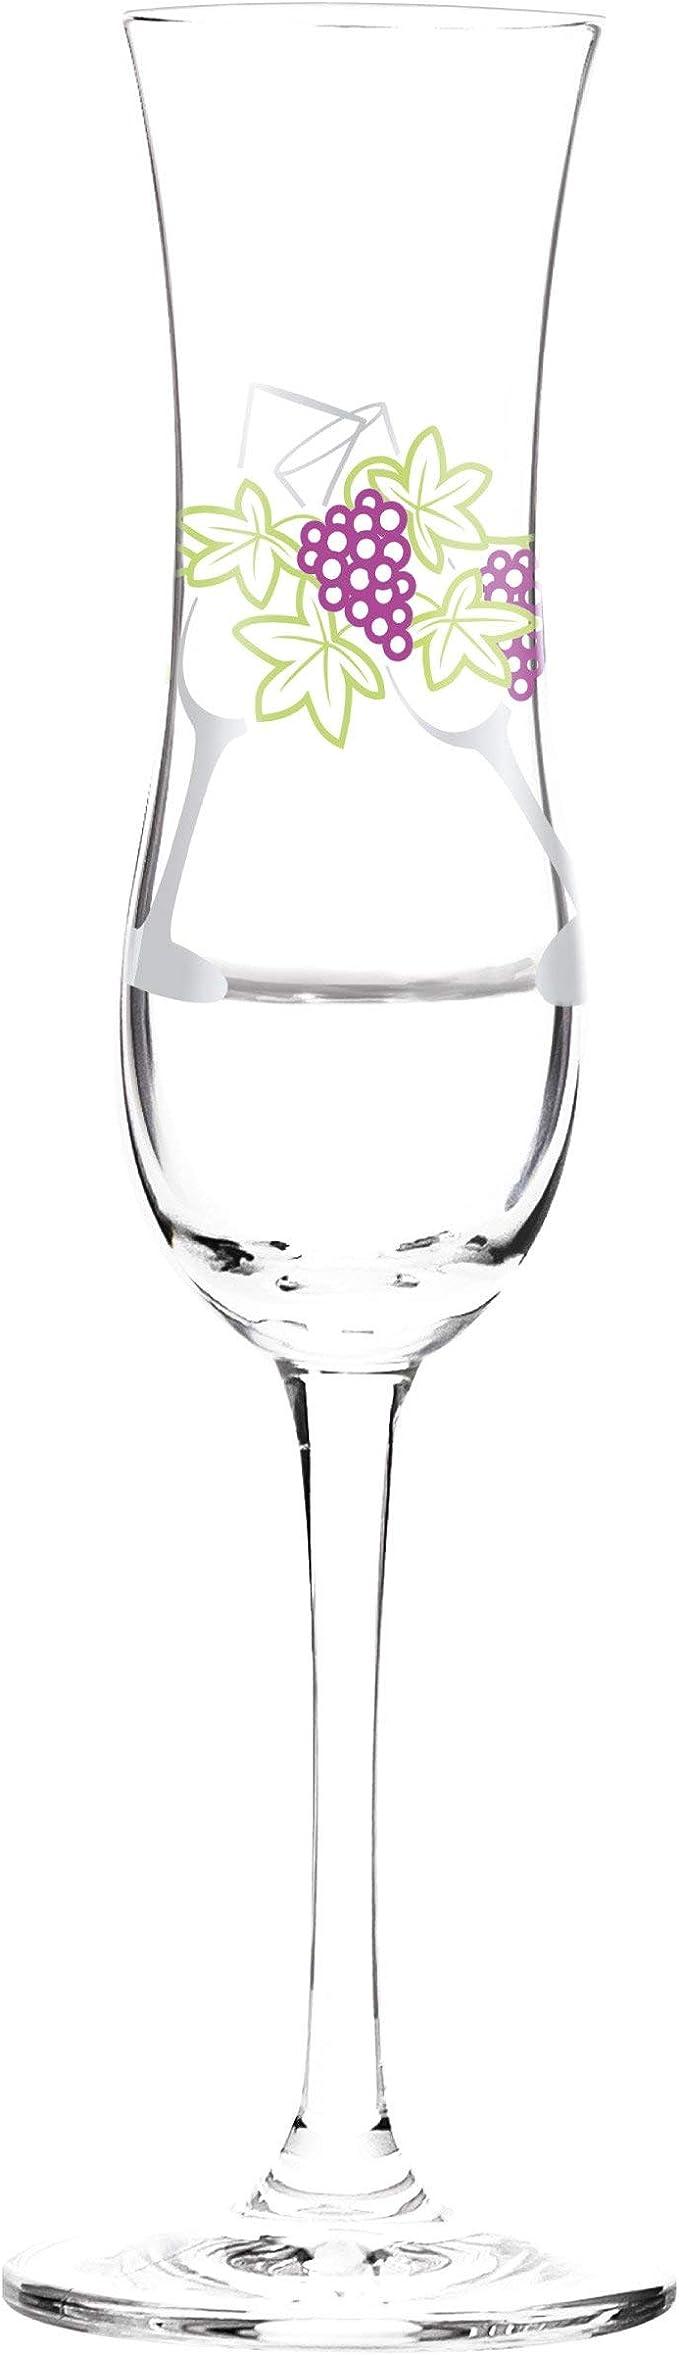 Mehrfarbig Glas RITZENHOFF Grappaglas